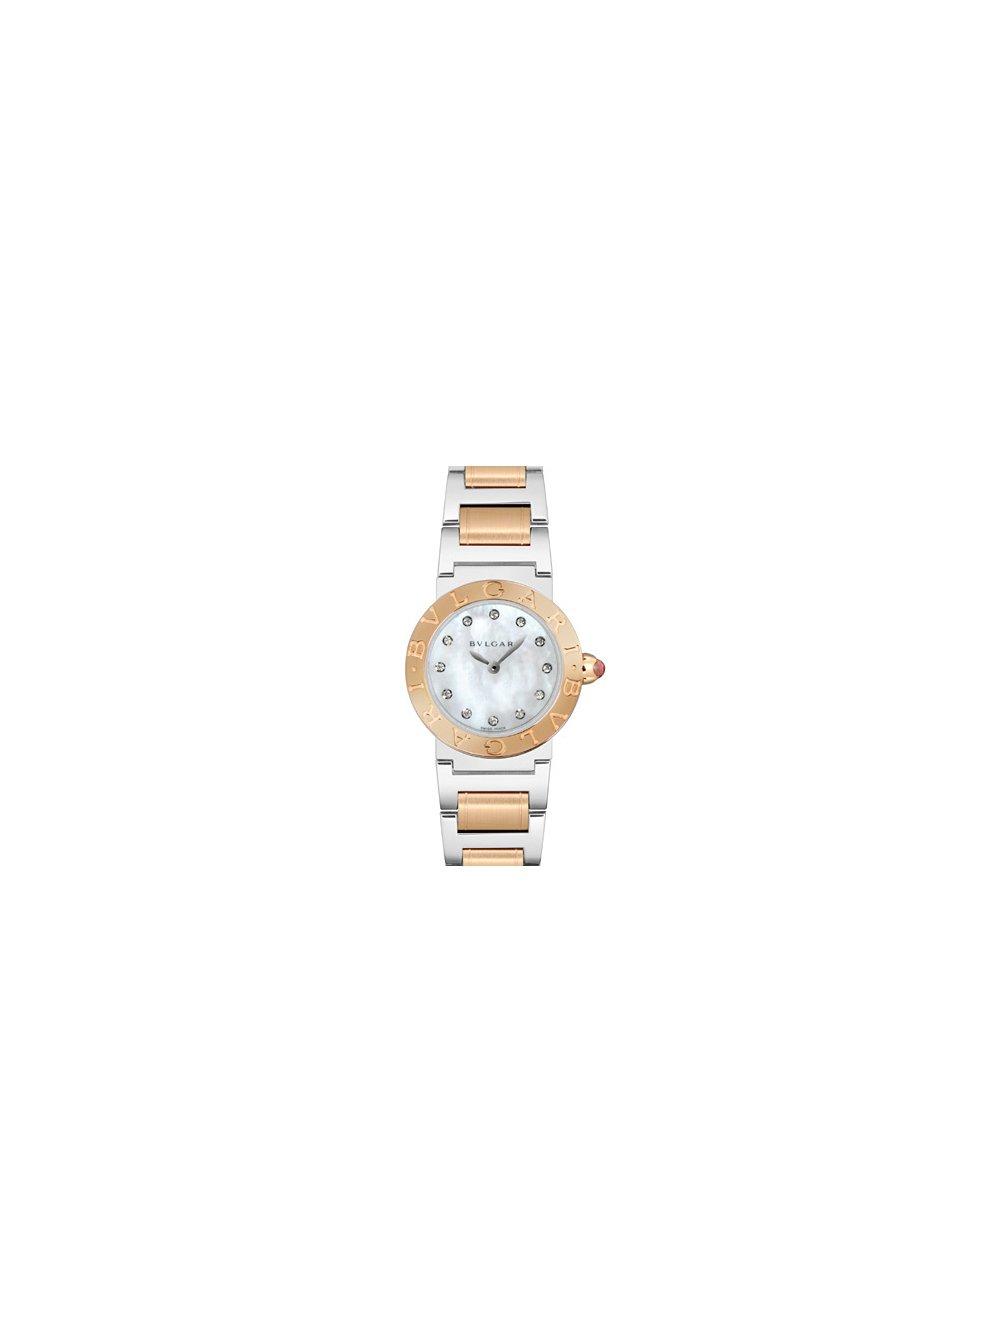 198e093c3f5d2 Amazon.com: Bvlgari Bvlgari Mother of Pearl Dial Ladies Watch 102477 ...